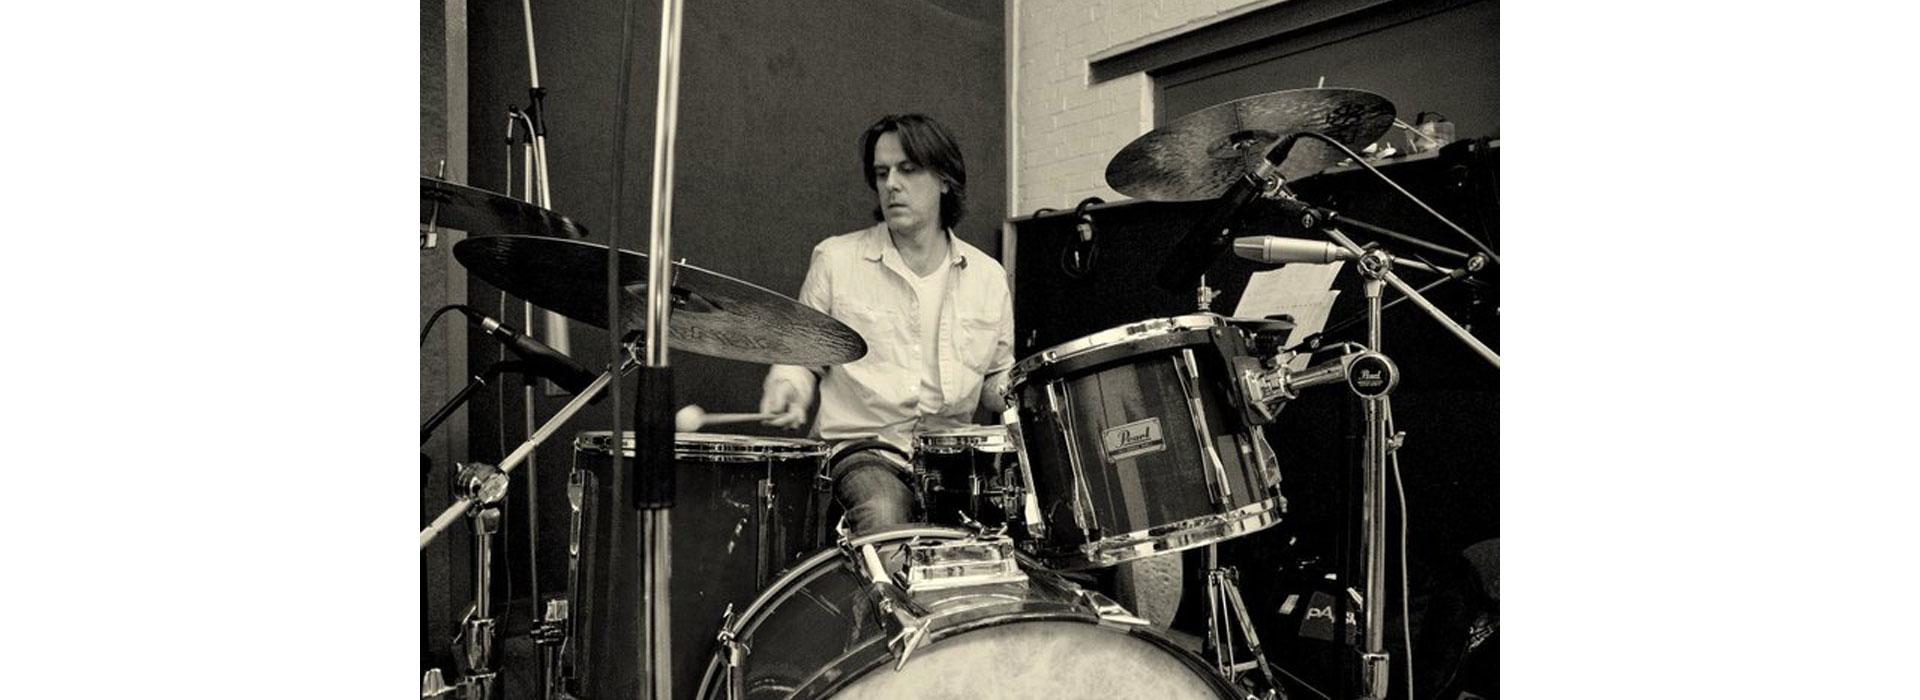 Roy Martin in the studio